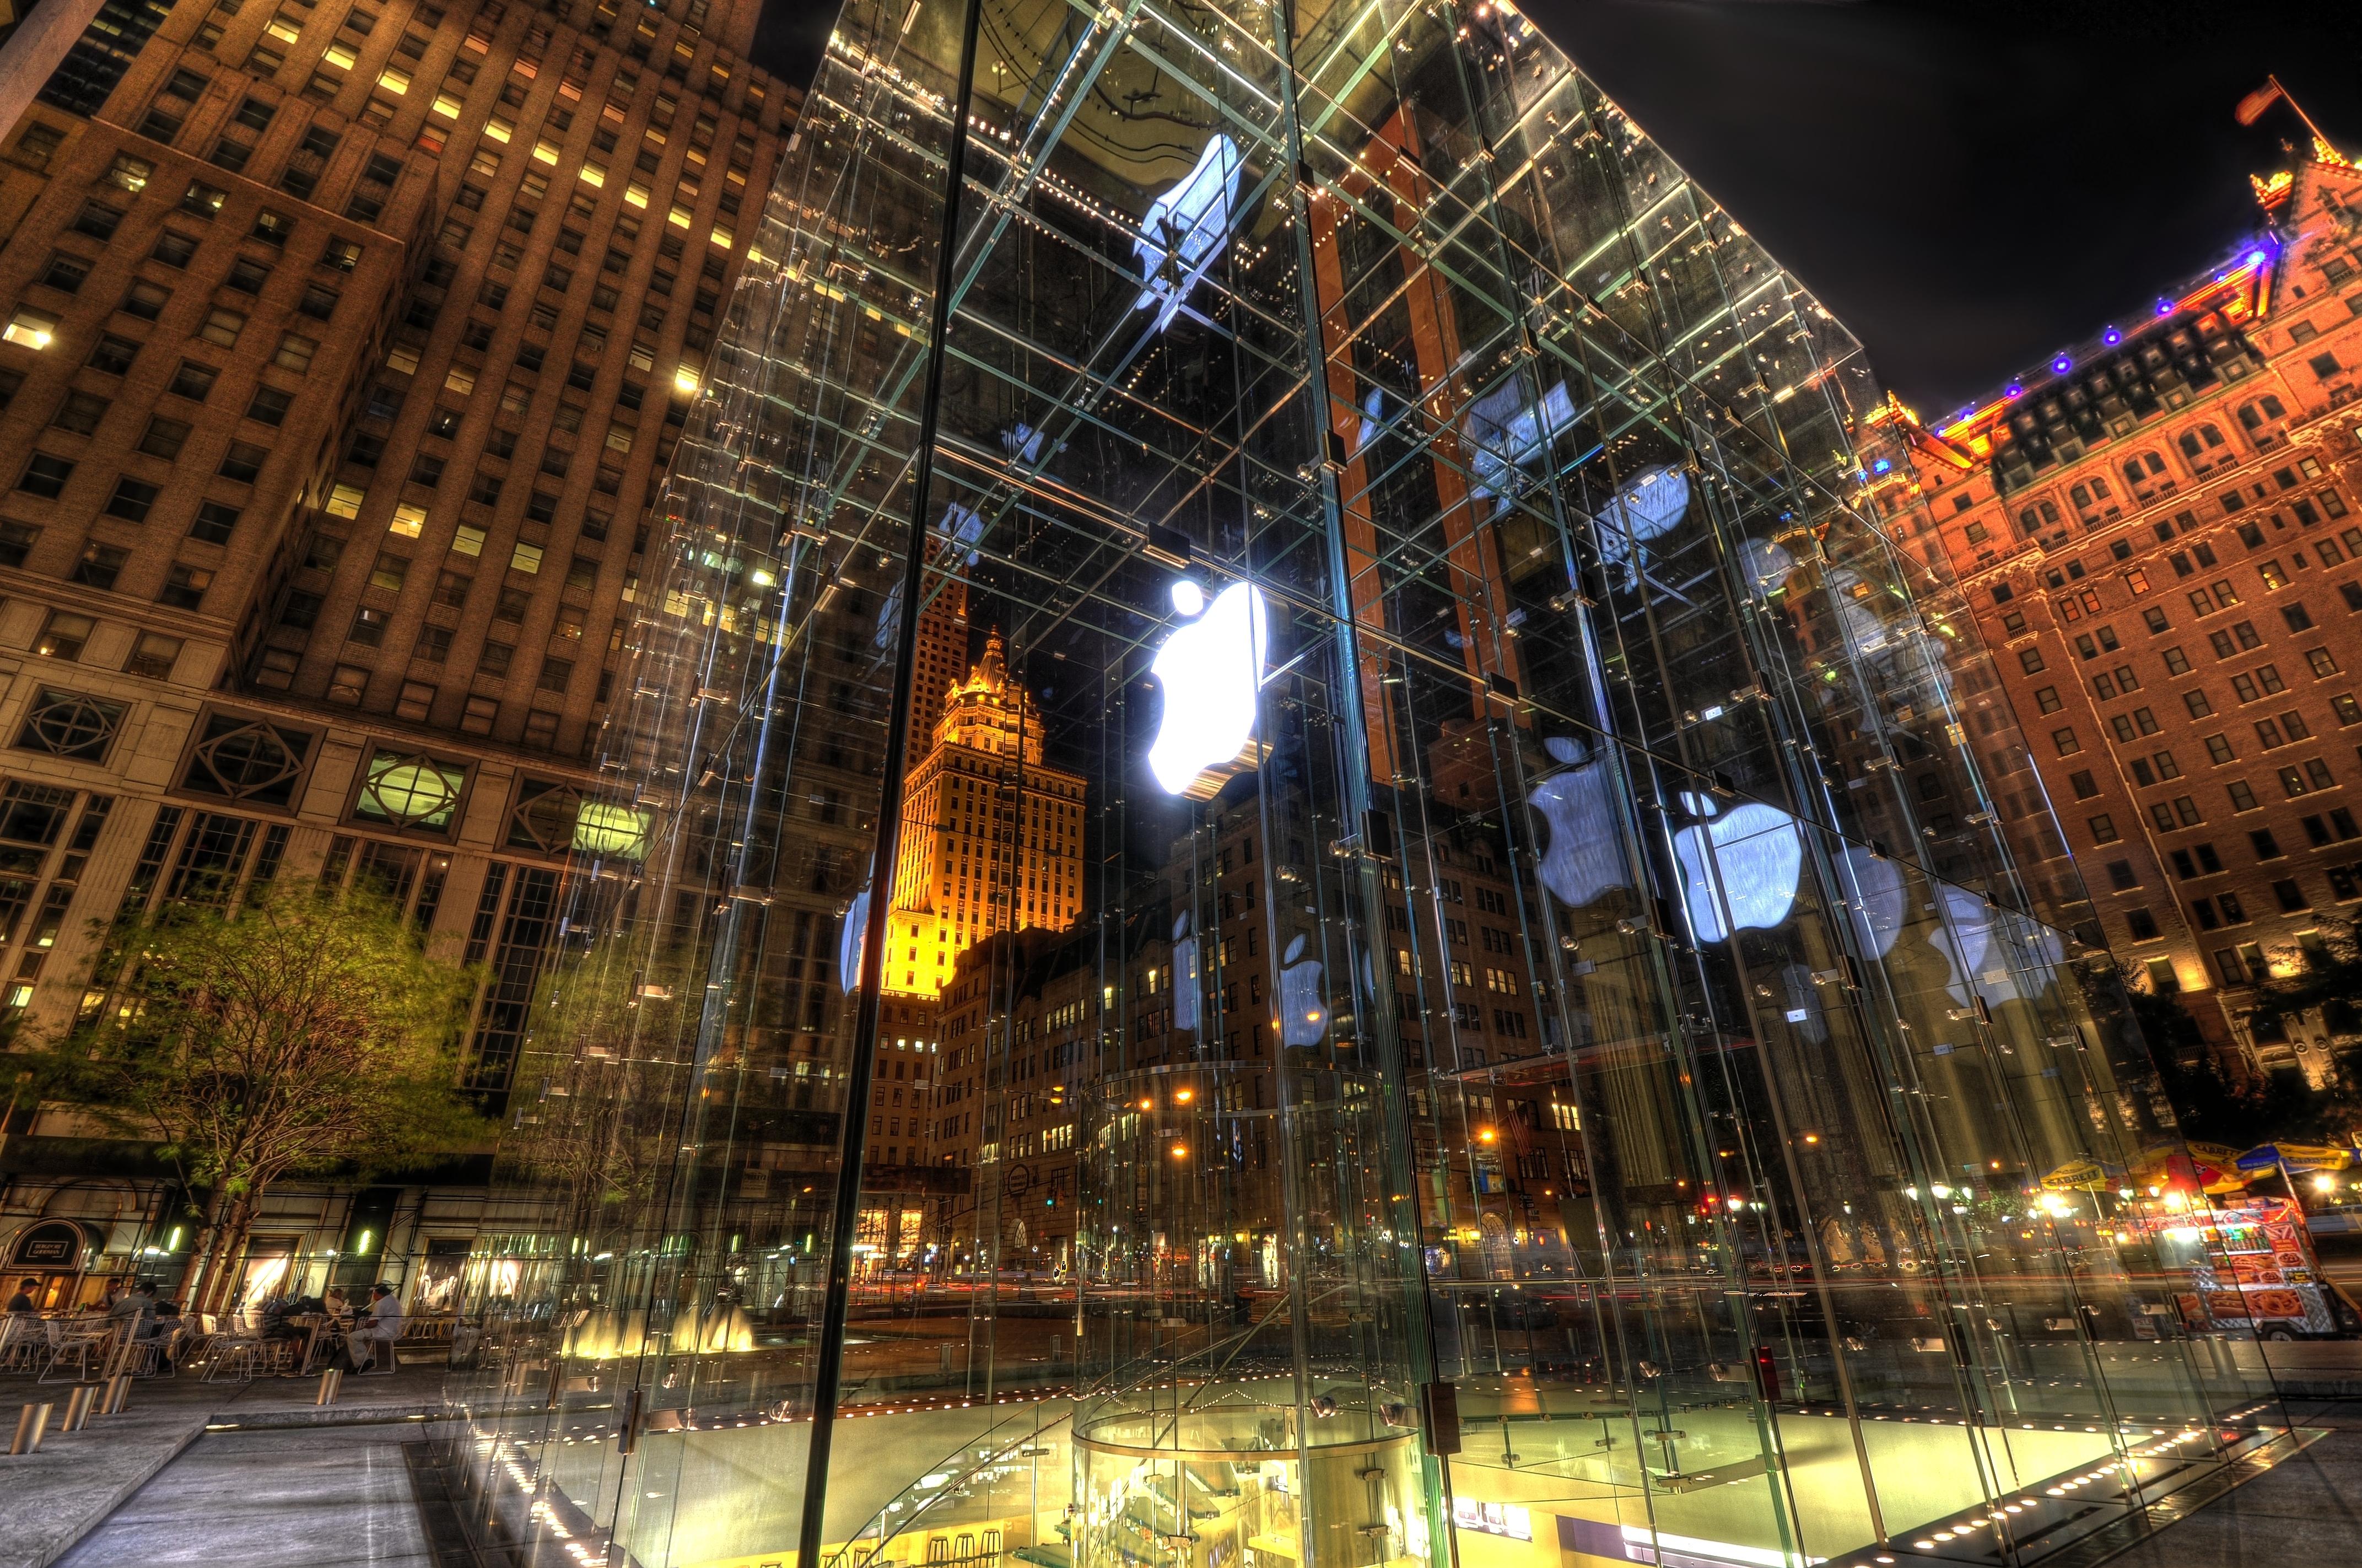 The Apple Store In New York City 4k Ultra Hd Wallpaper